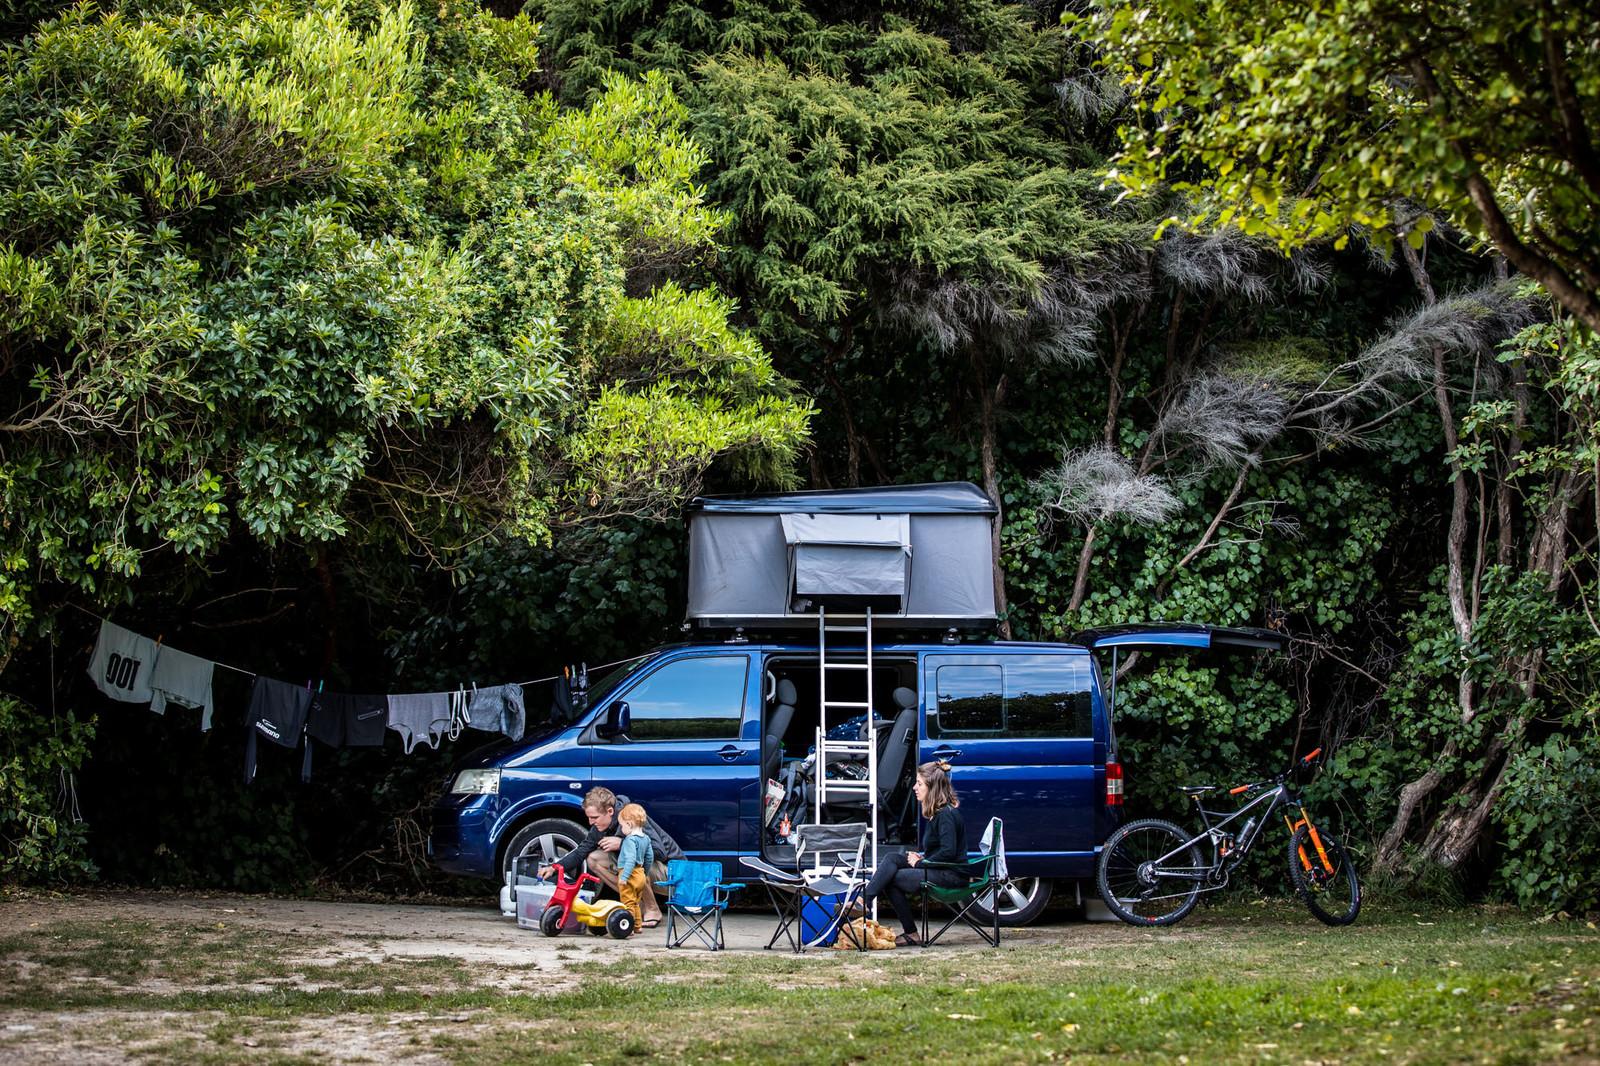 NZEnduro19 BB 898A9117 - 2019 NZ Enduro Day 1 Photo Gallery - Mountain Biking Pictures - Vital MTB